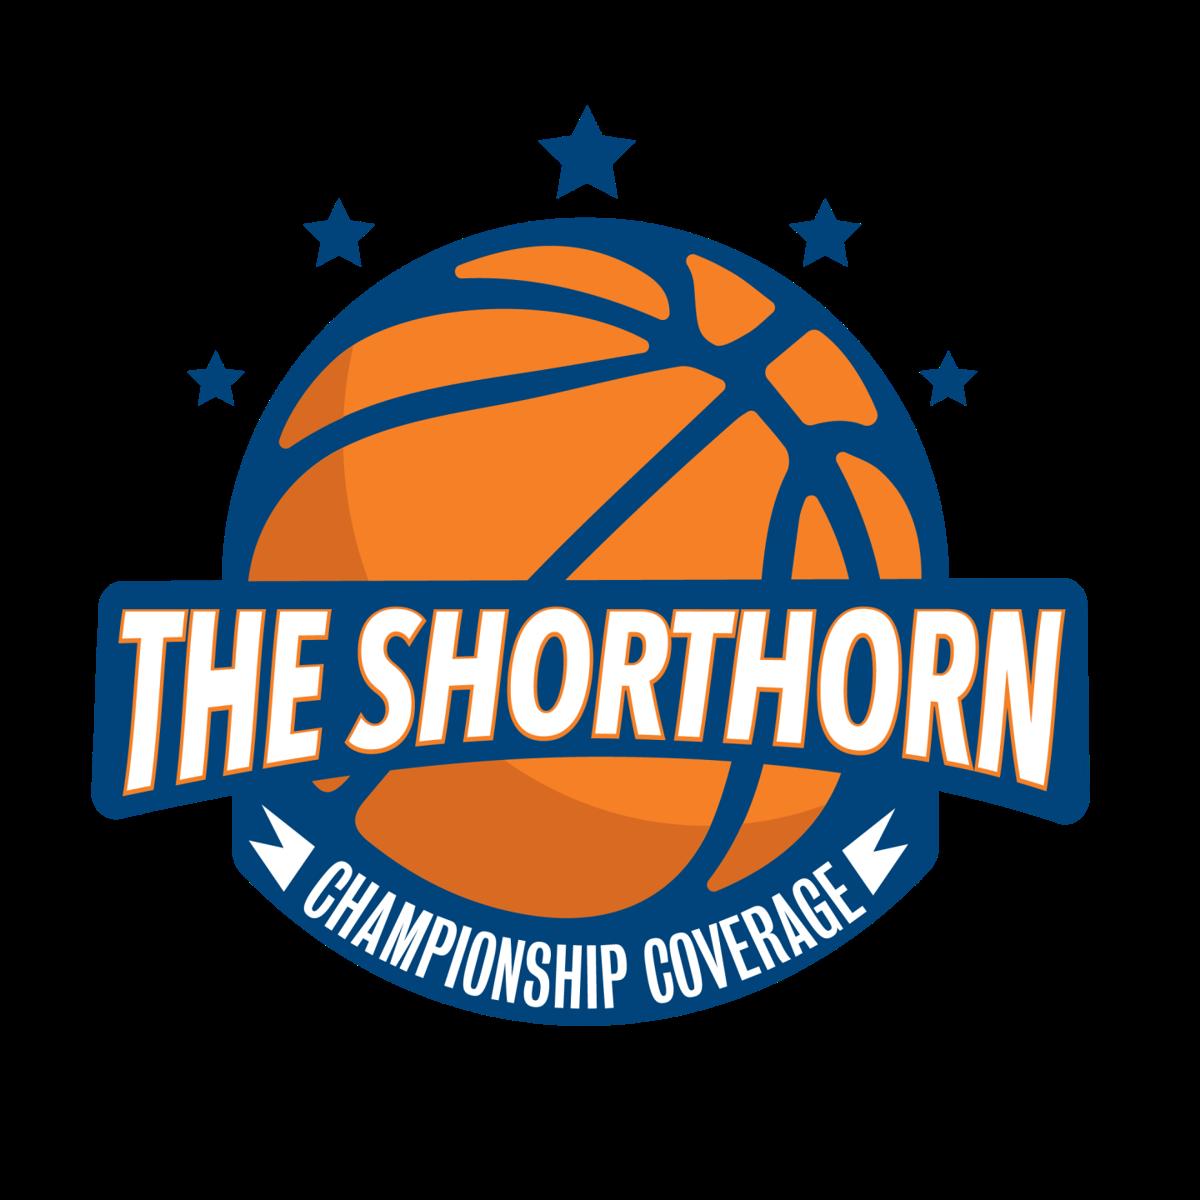 Shorthorn bball coverage